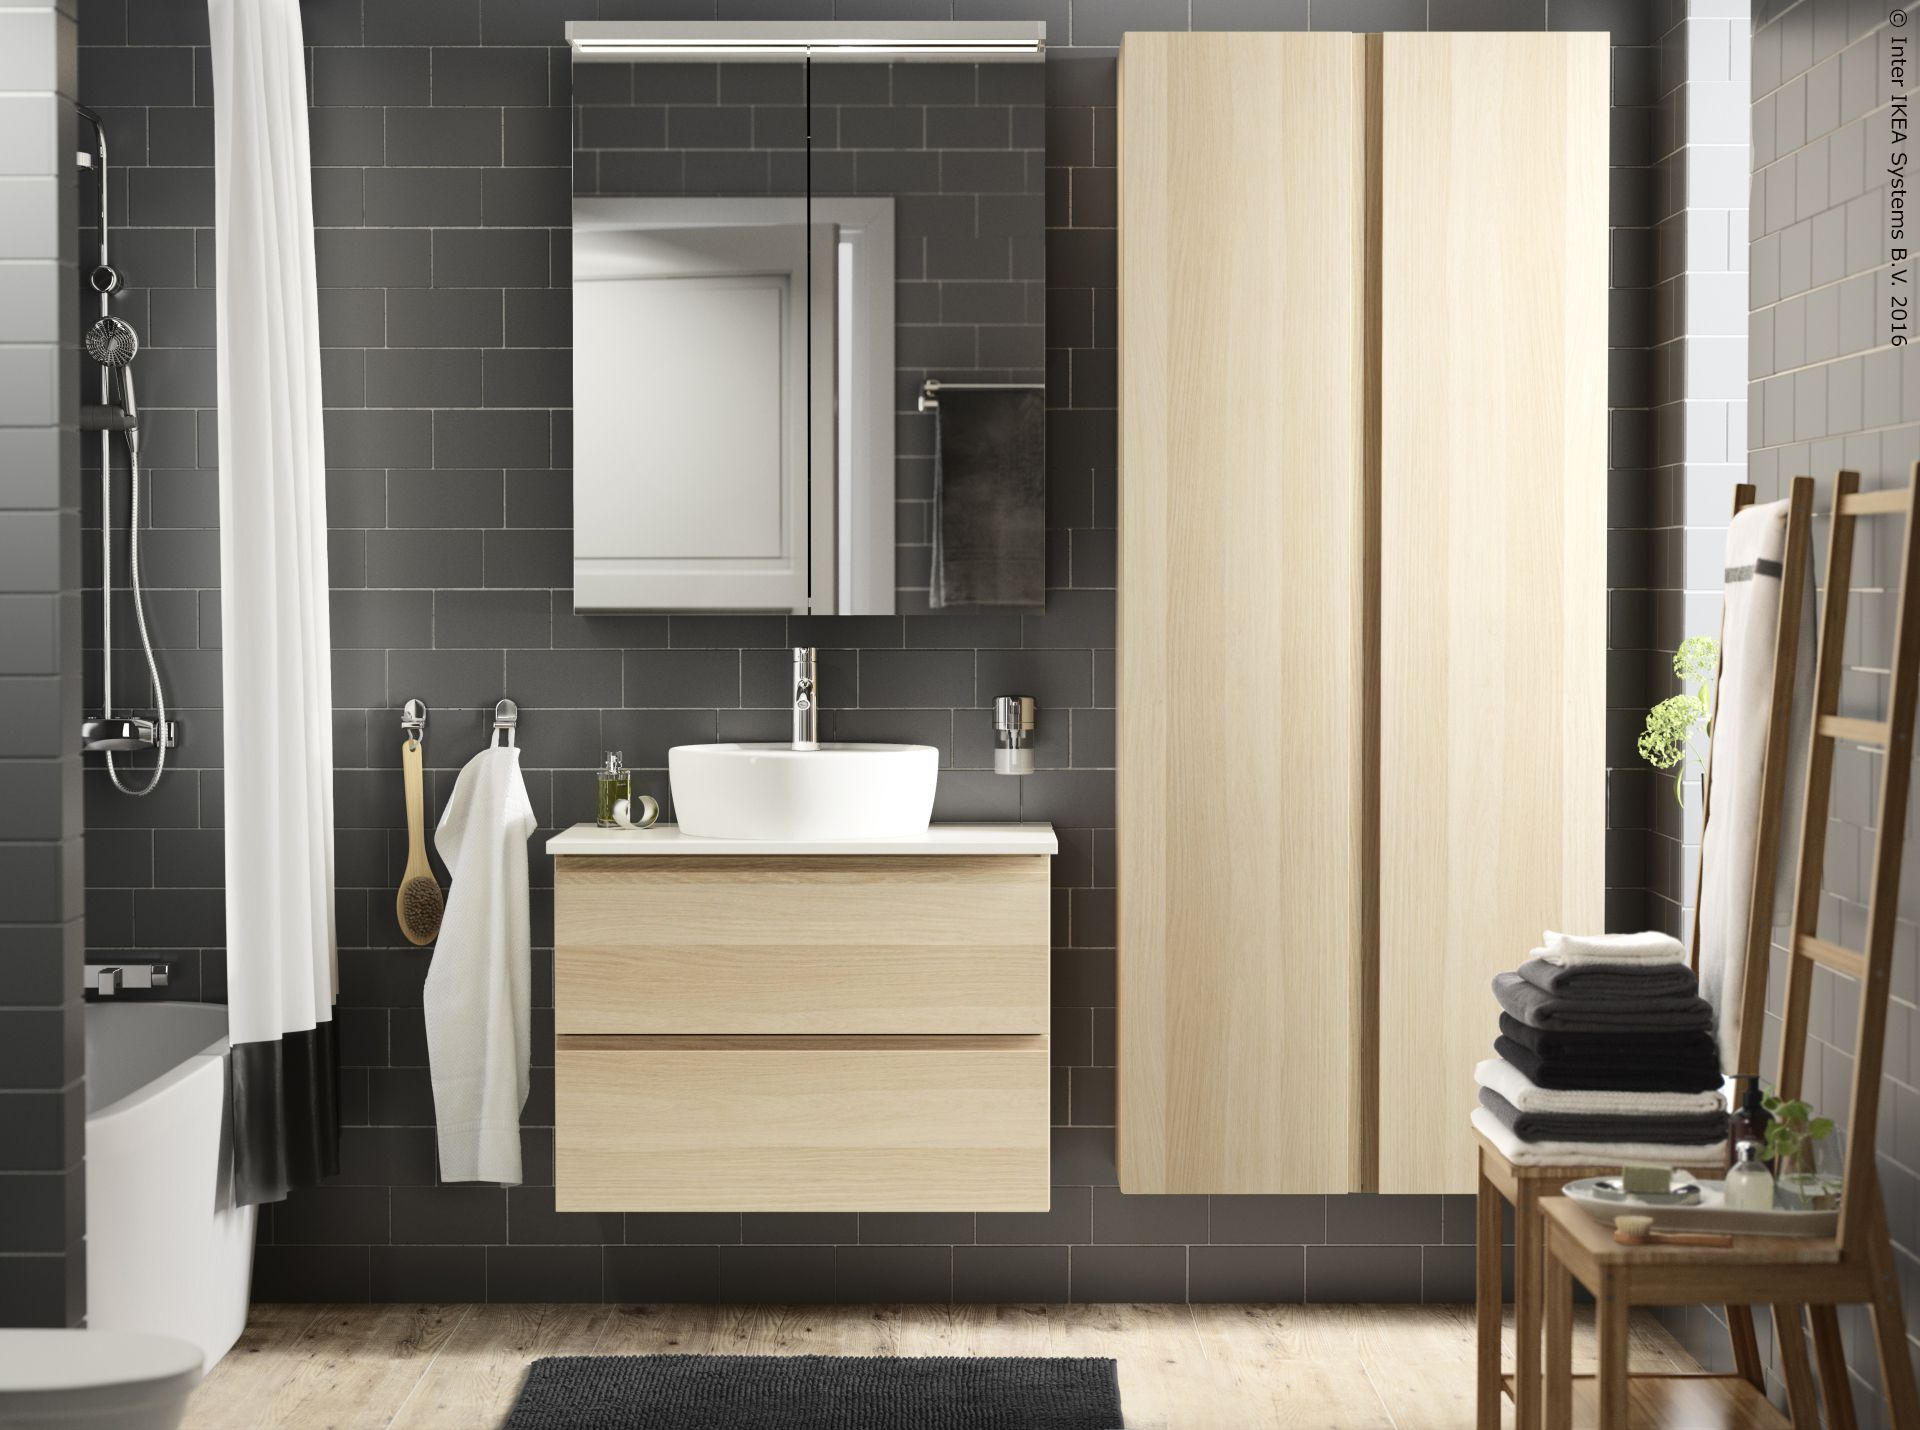 Bathroom Mirror Za godmorgon/aldern/tÖrnviken element za umivaonik osim 10-godišnje